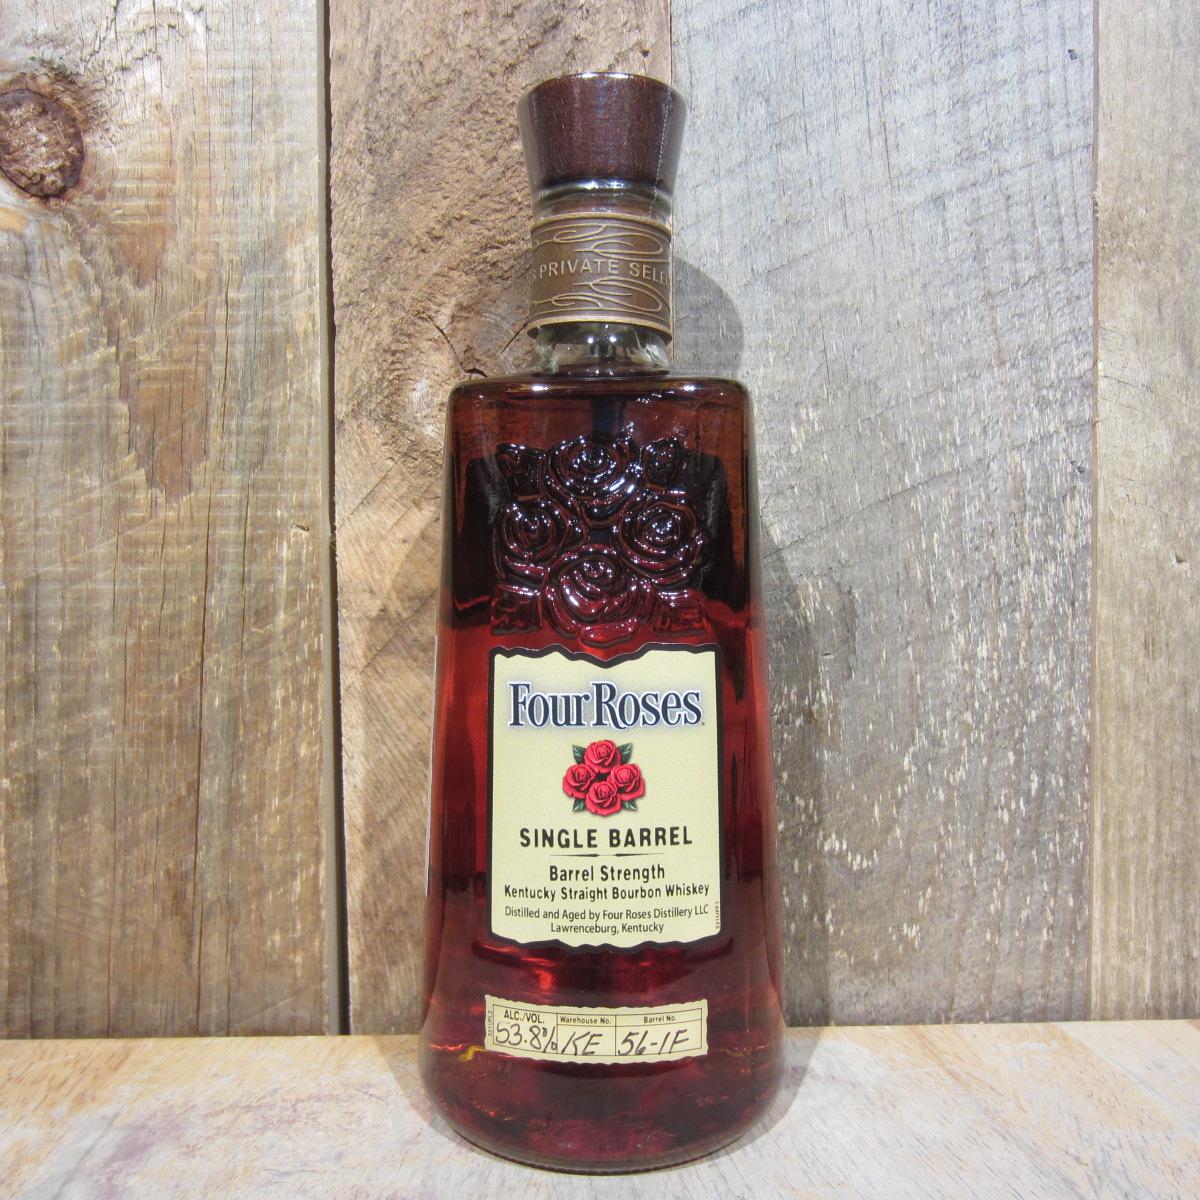 Four Roses Single Barrel Bourbon OESF PS 107.6 750ml